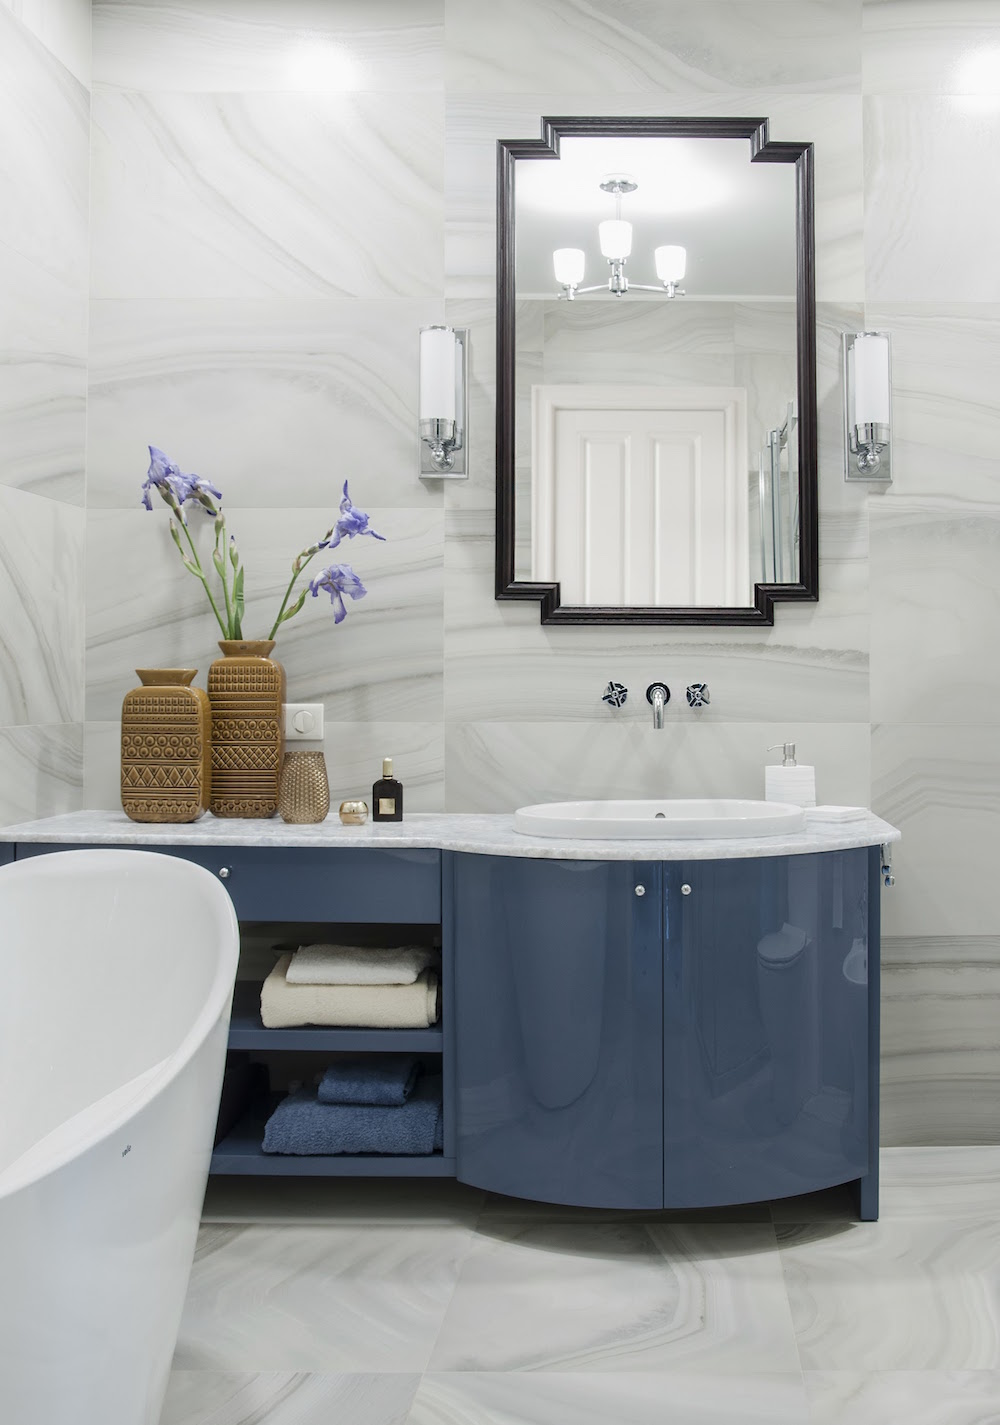 Art decor apartment bathroom vanity